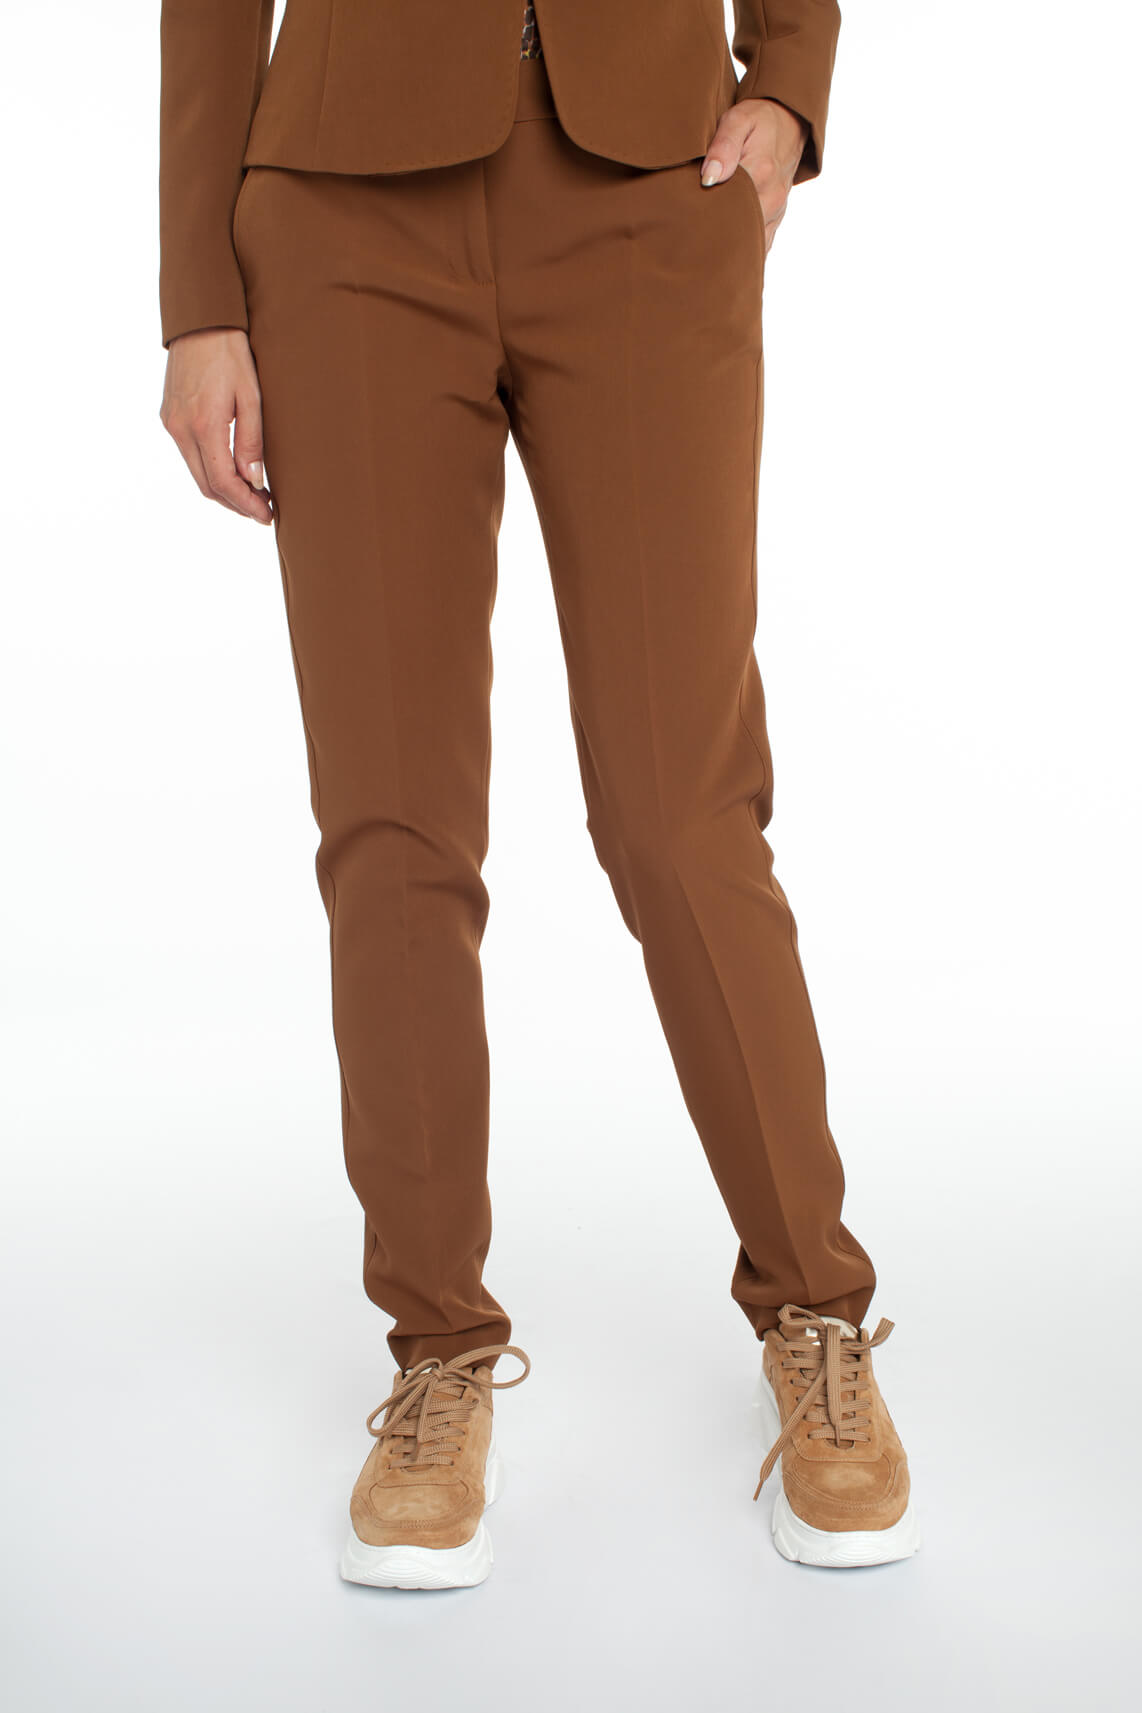 Kocca Dames Lian pantalon Bruin